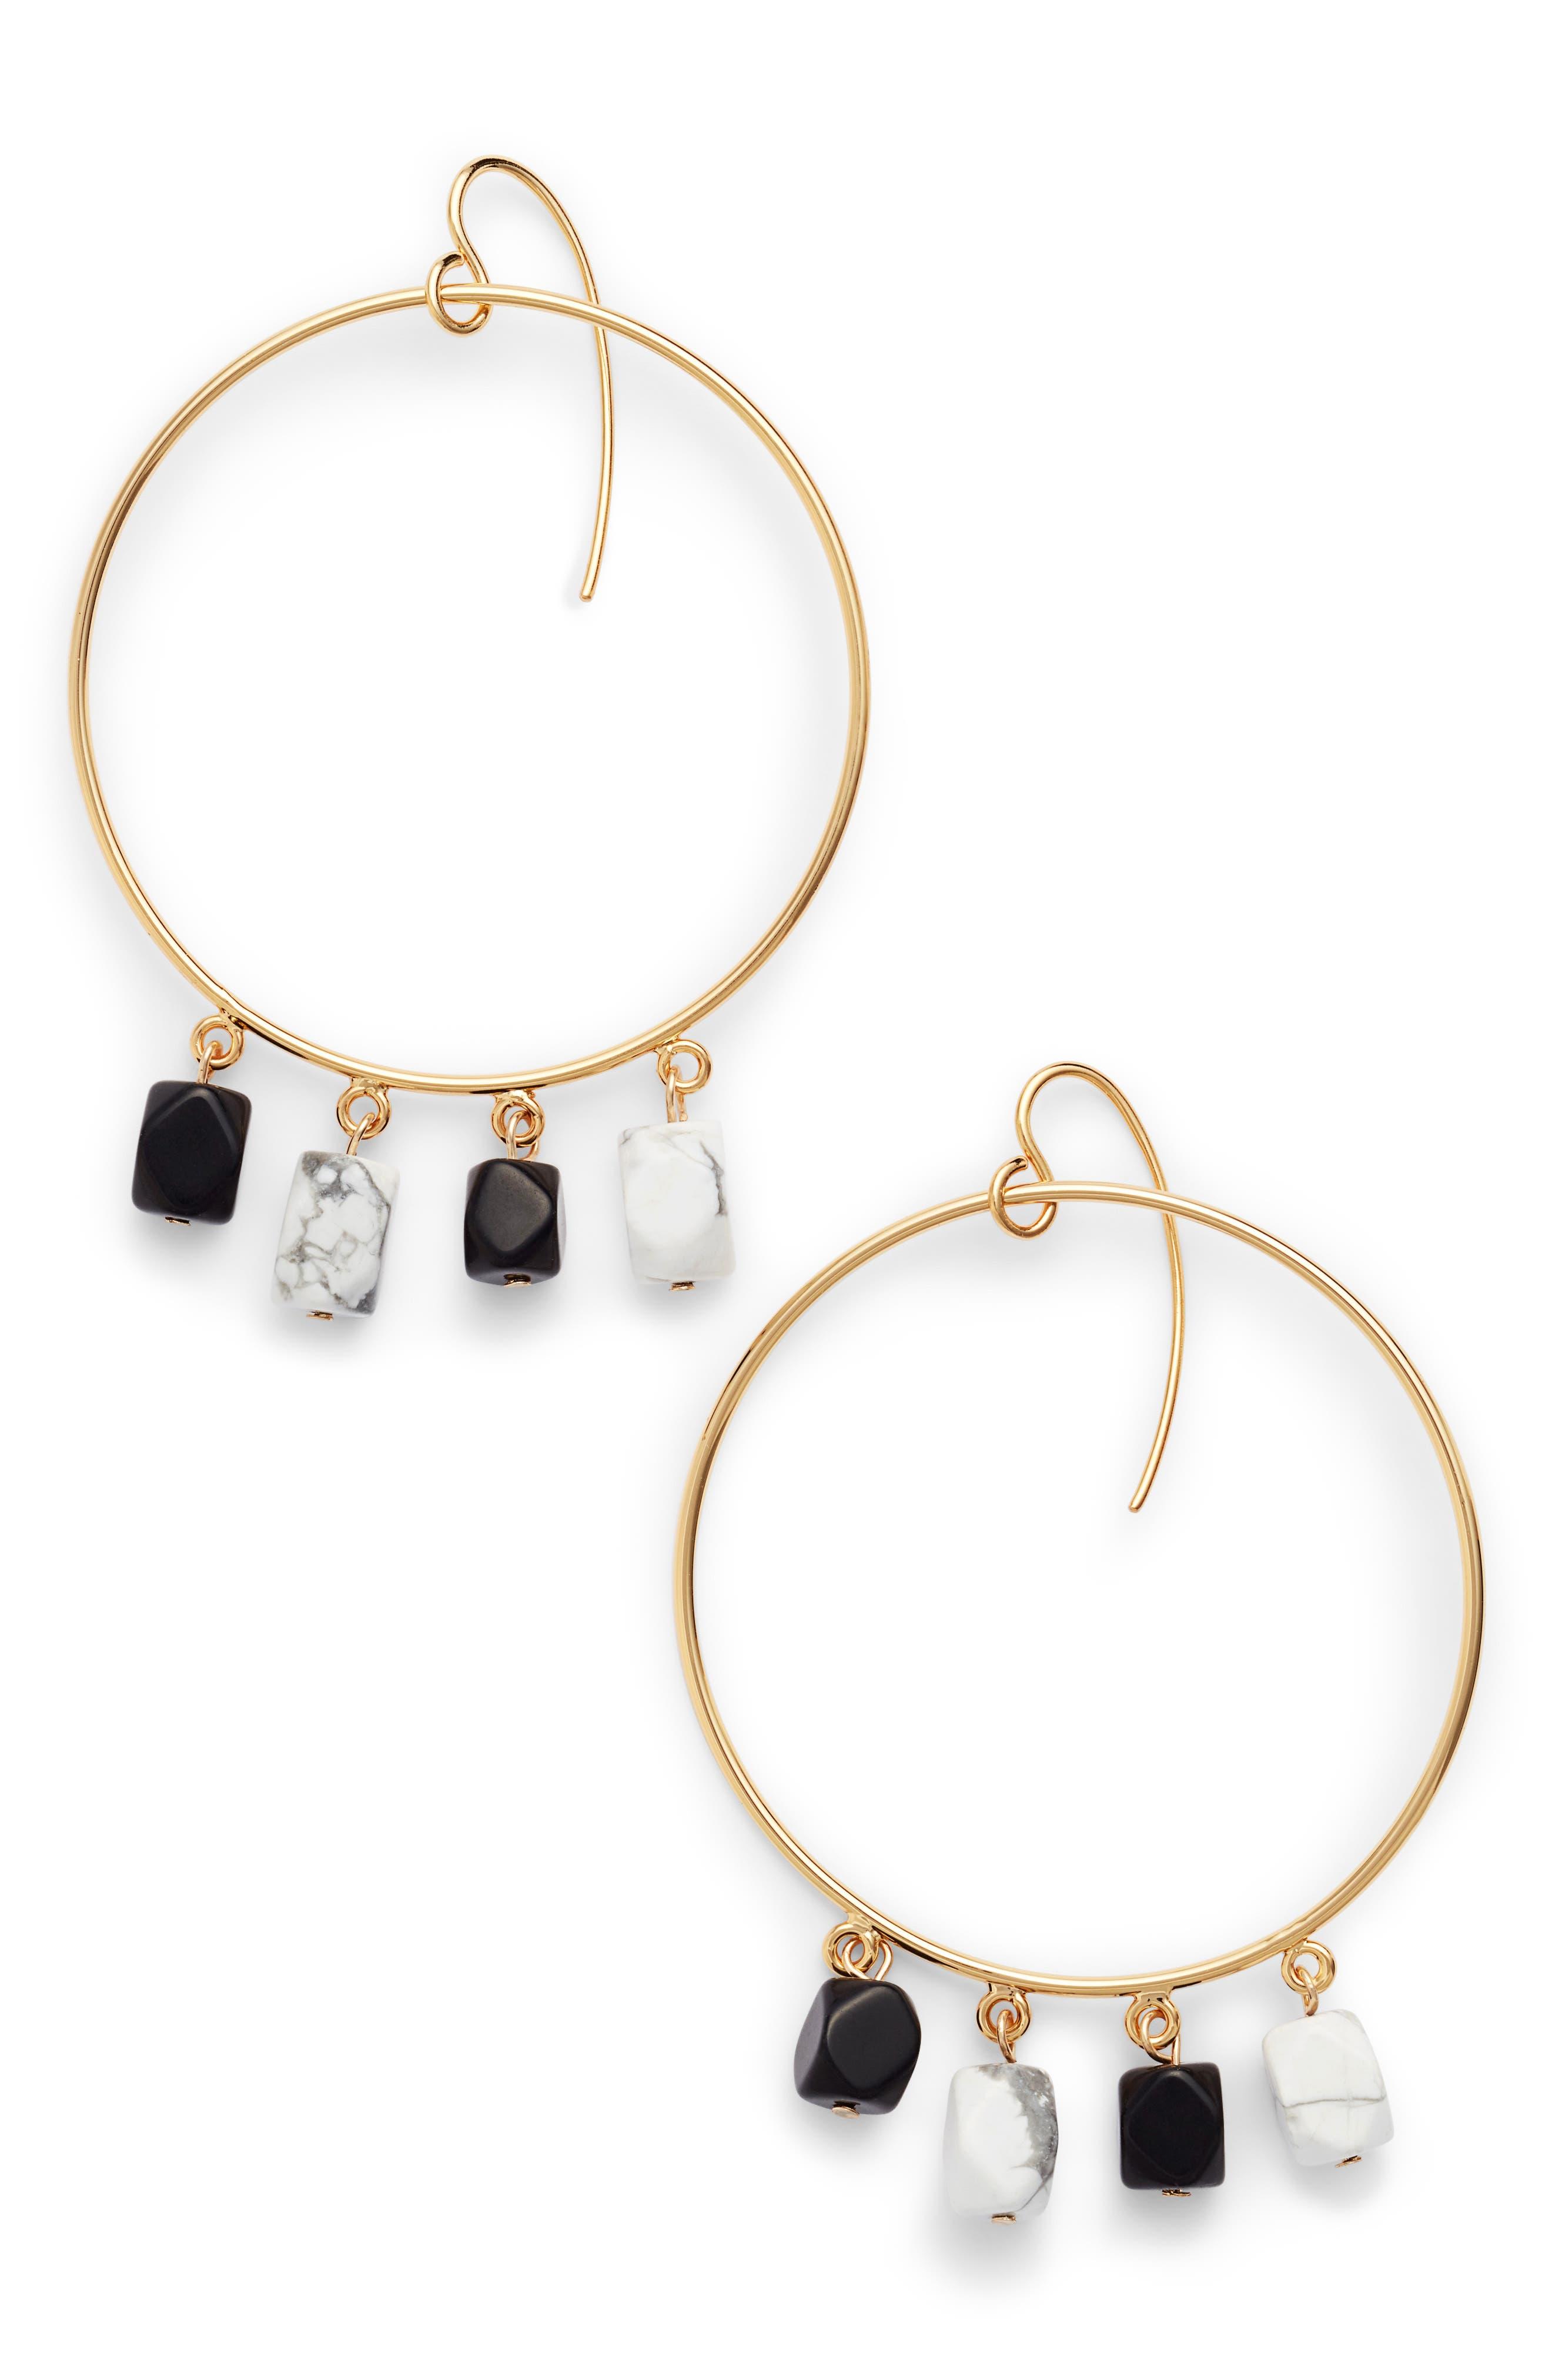 Beaded Hoop Earrings,                         Main,                         color, Gold/ Black/ White